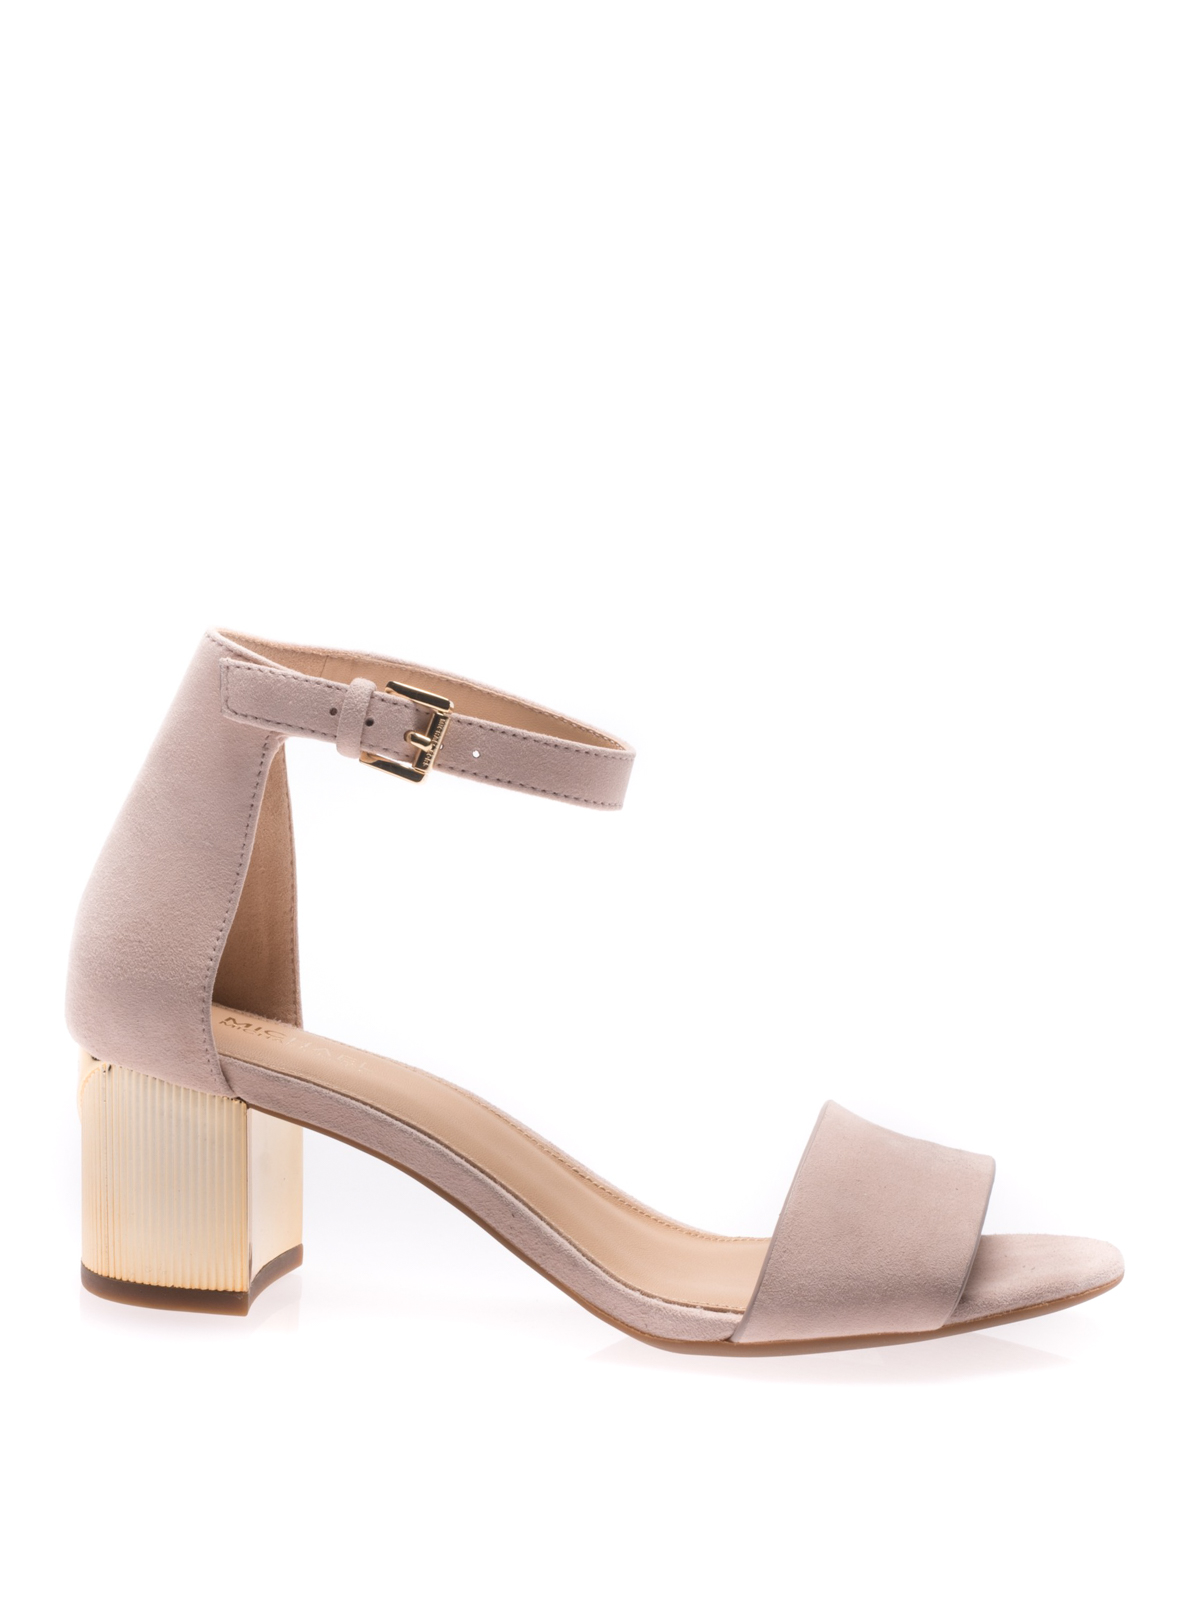 Paloma Flex gold heel pink sandals